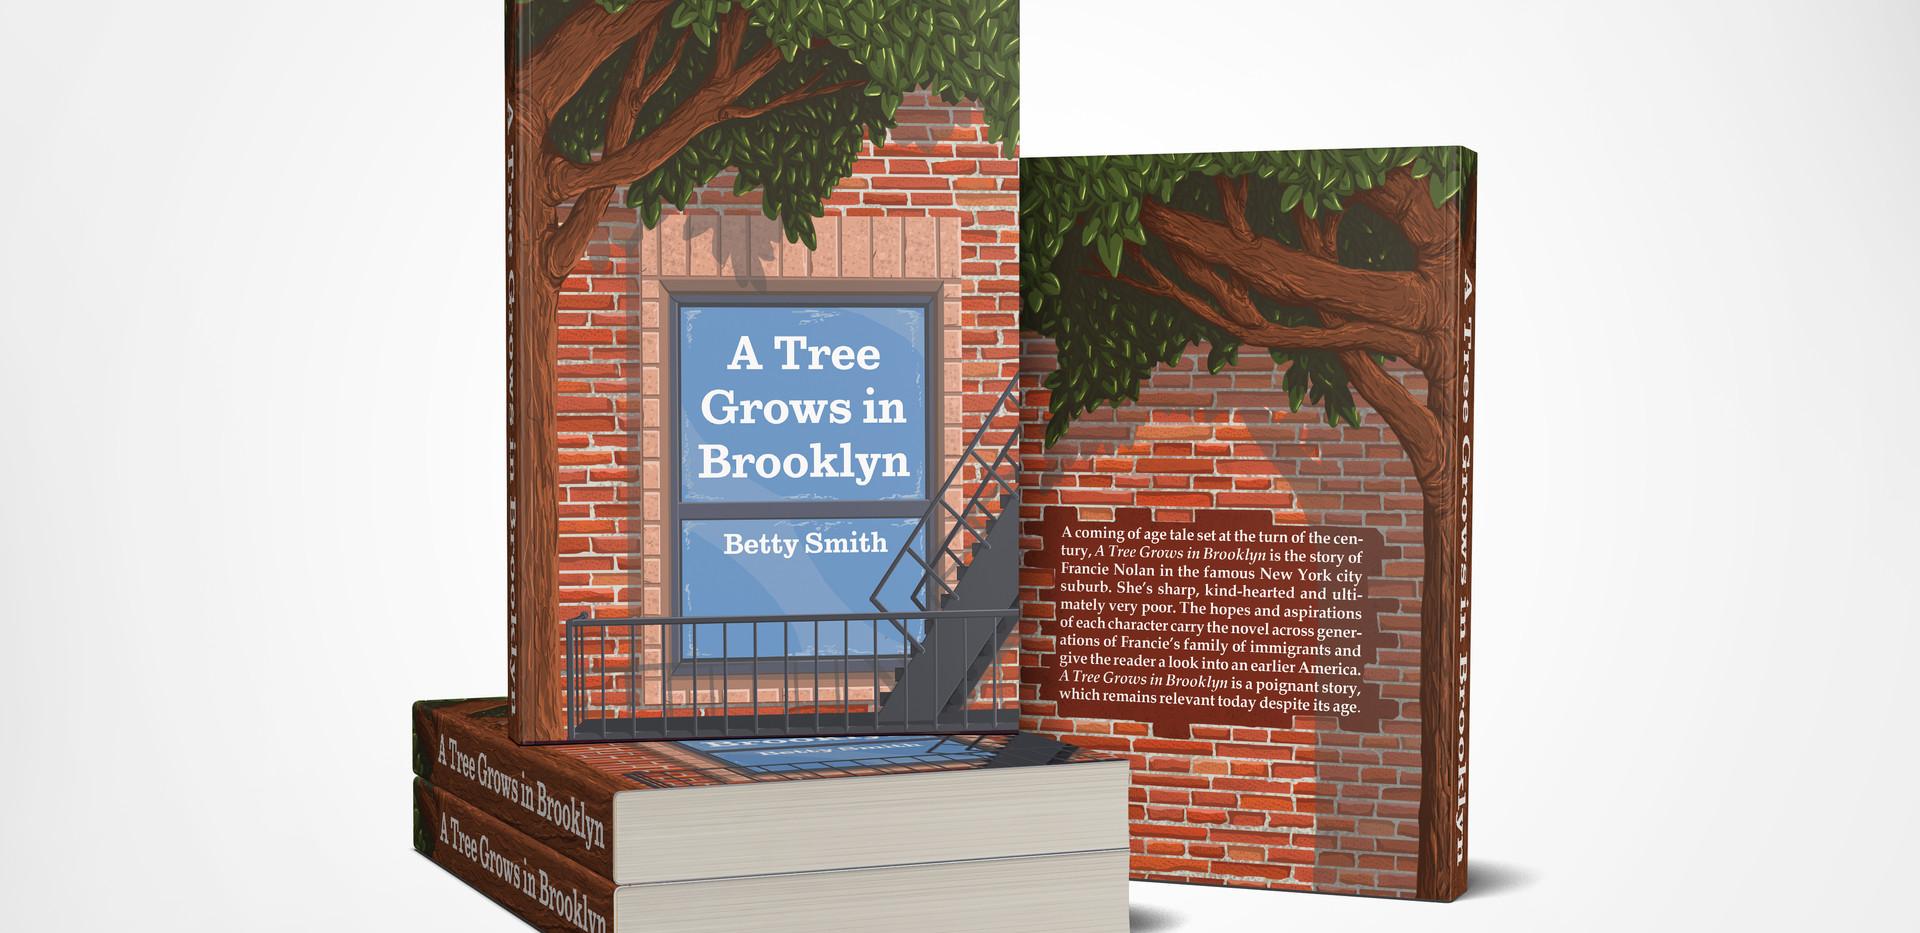 BrooklynMockUp.jpg